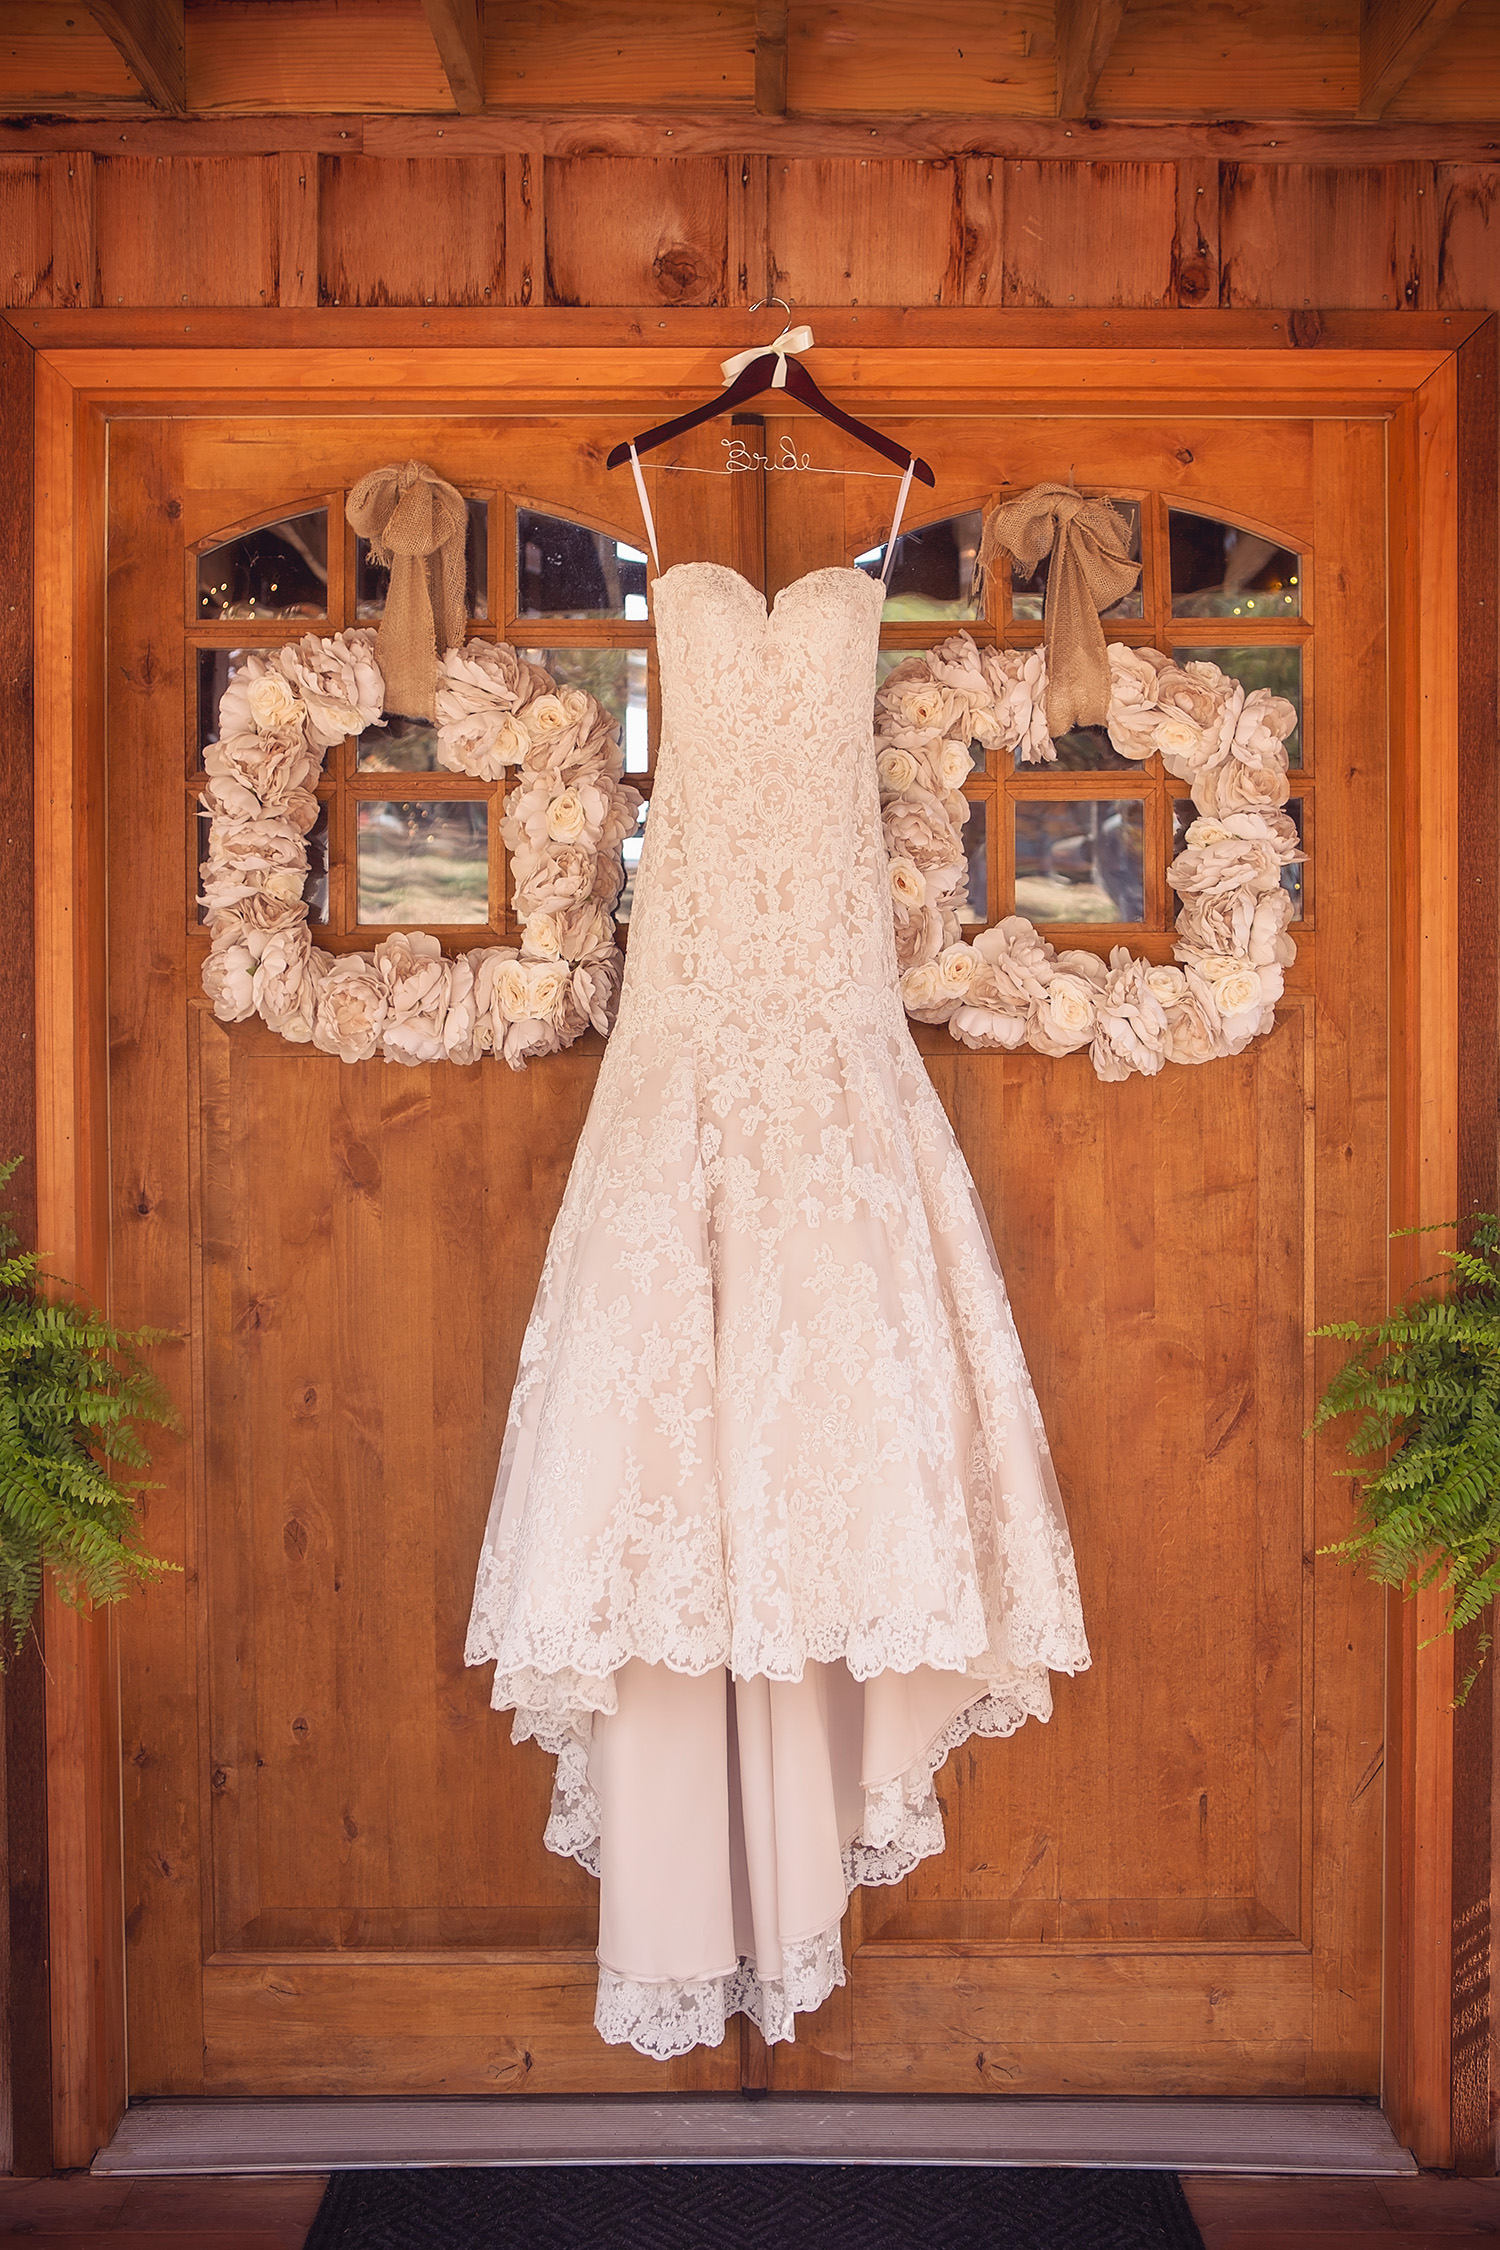 Bride's dress hangs in the doorway of the Weathered Wisdom Barn wedding venue in Buffalo, Missouri